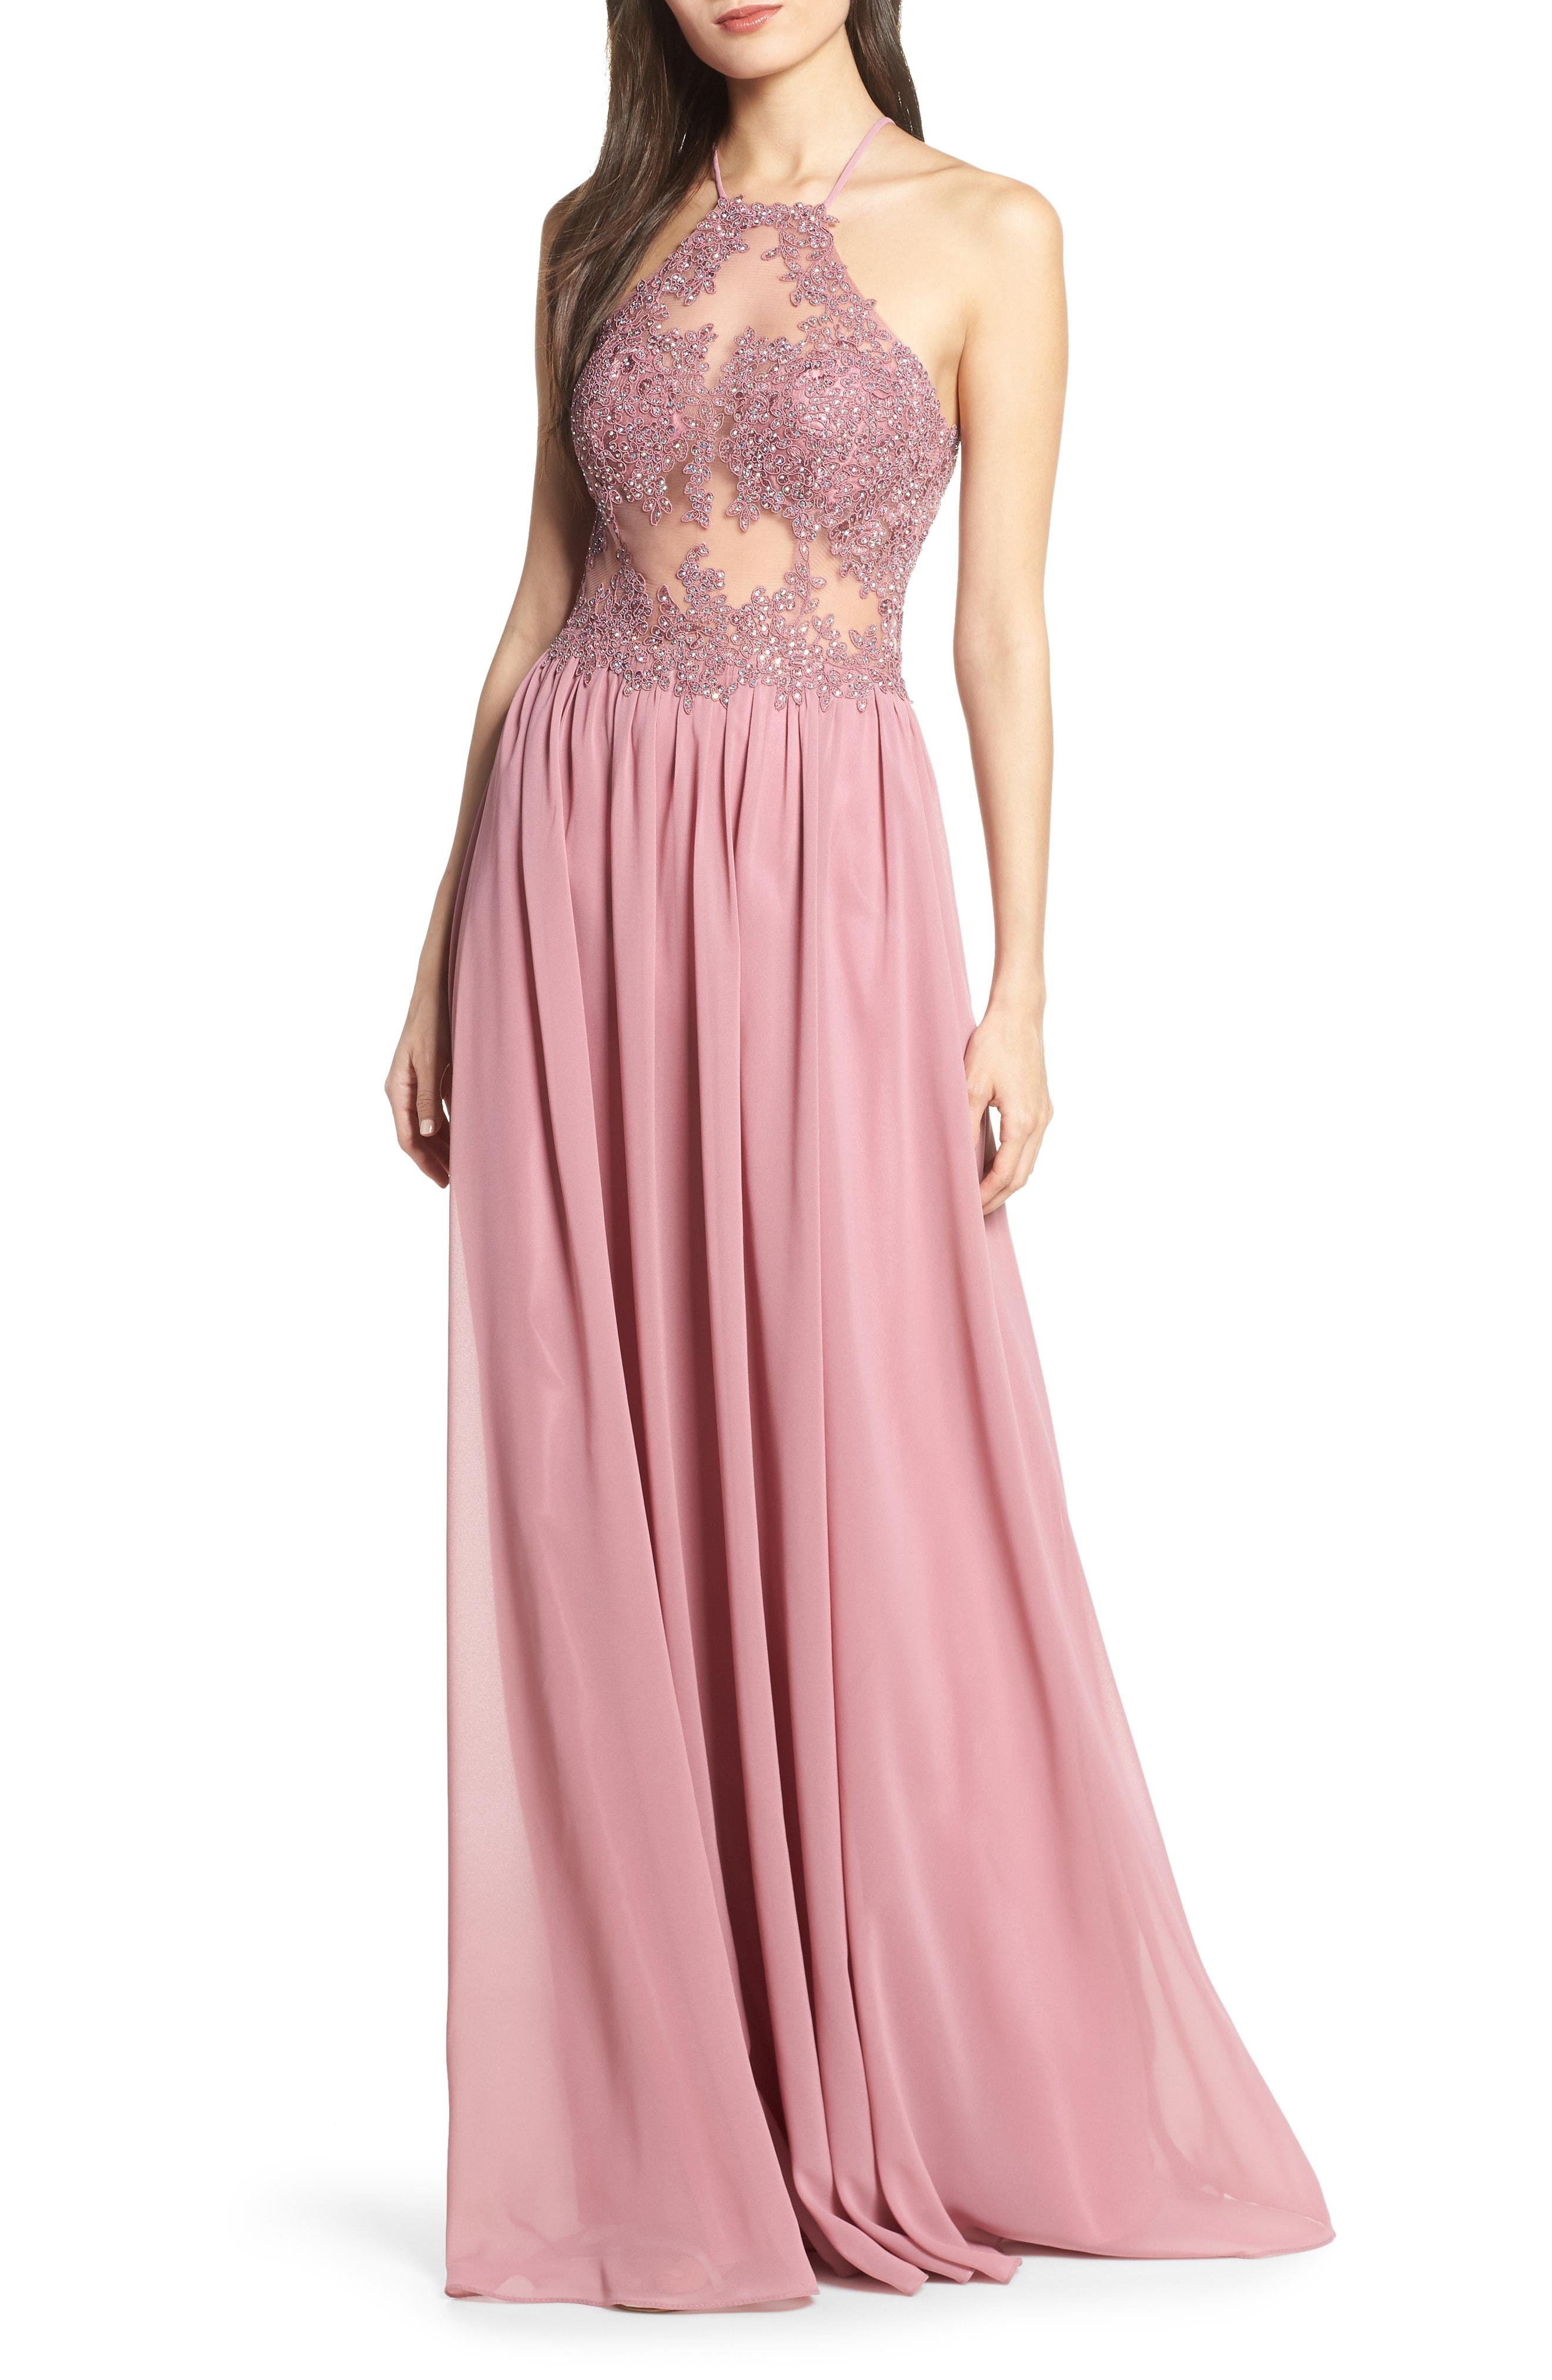 34d29366165 Blondie Nites. Women s Pink Embroidered Illusion Halter Bodice Evening Dress